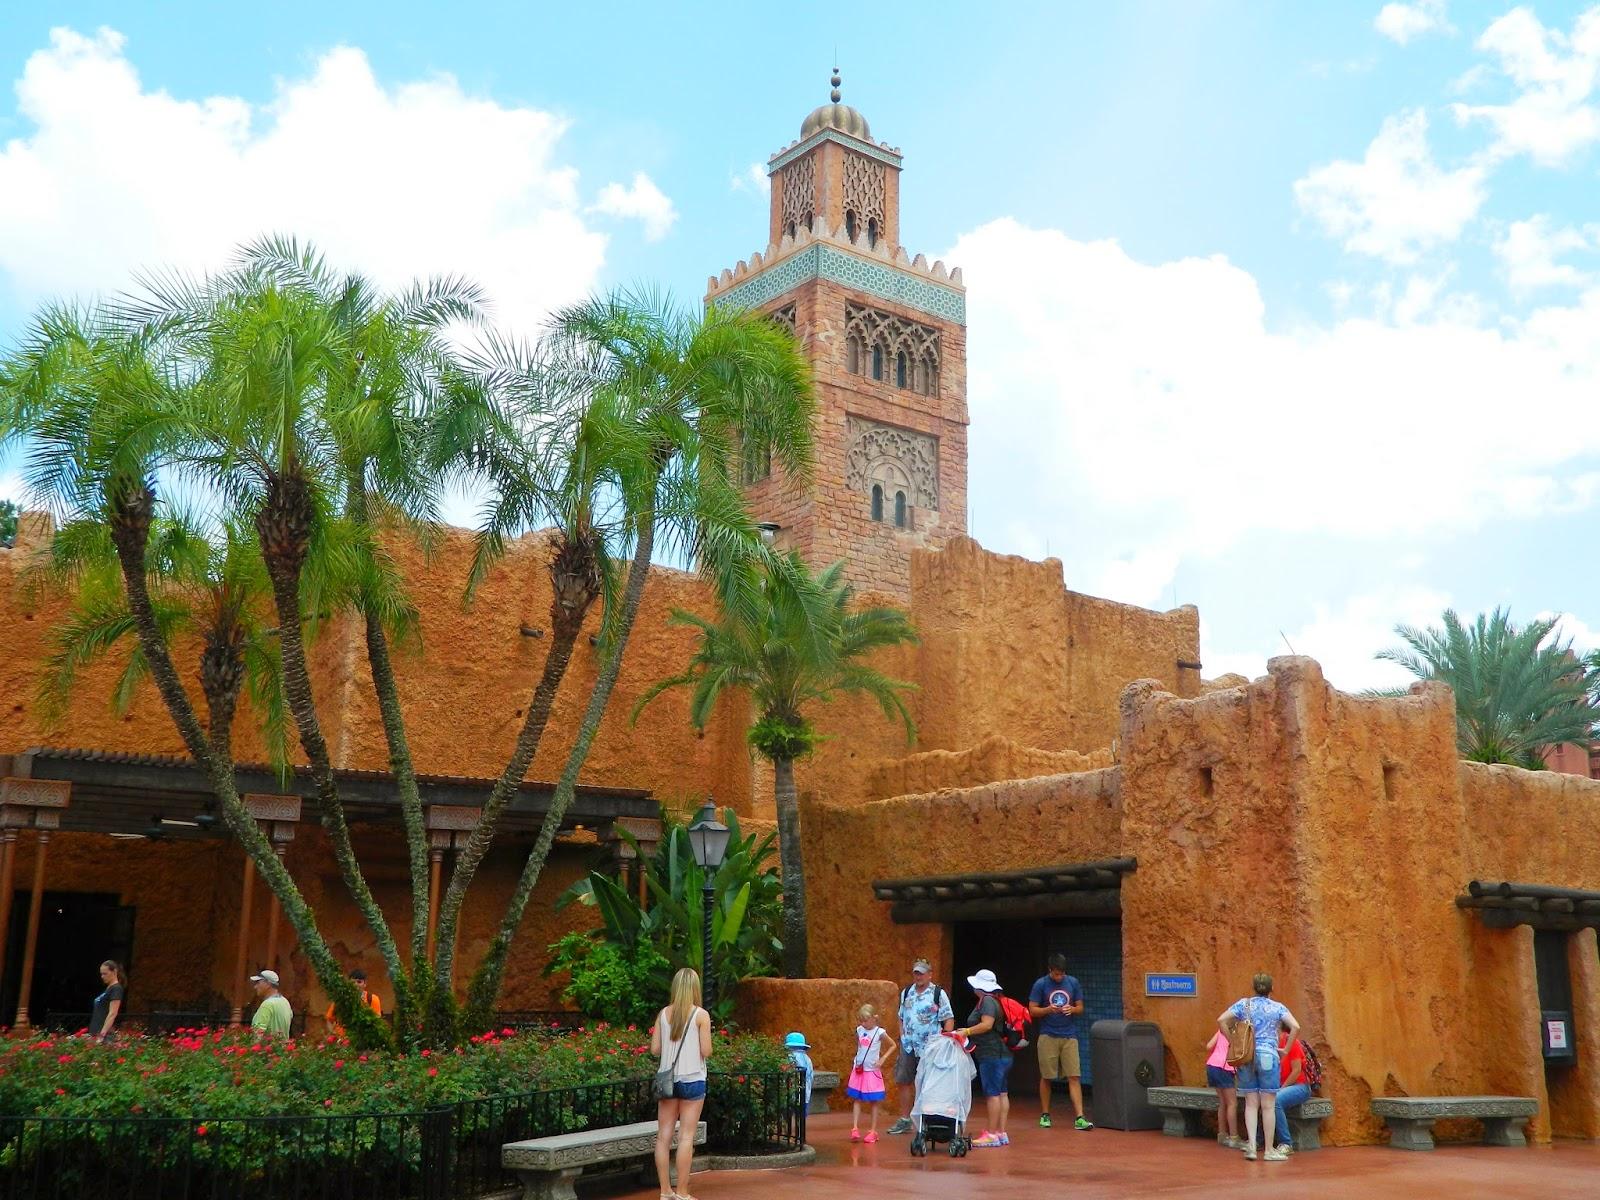 epcot morocco building